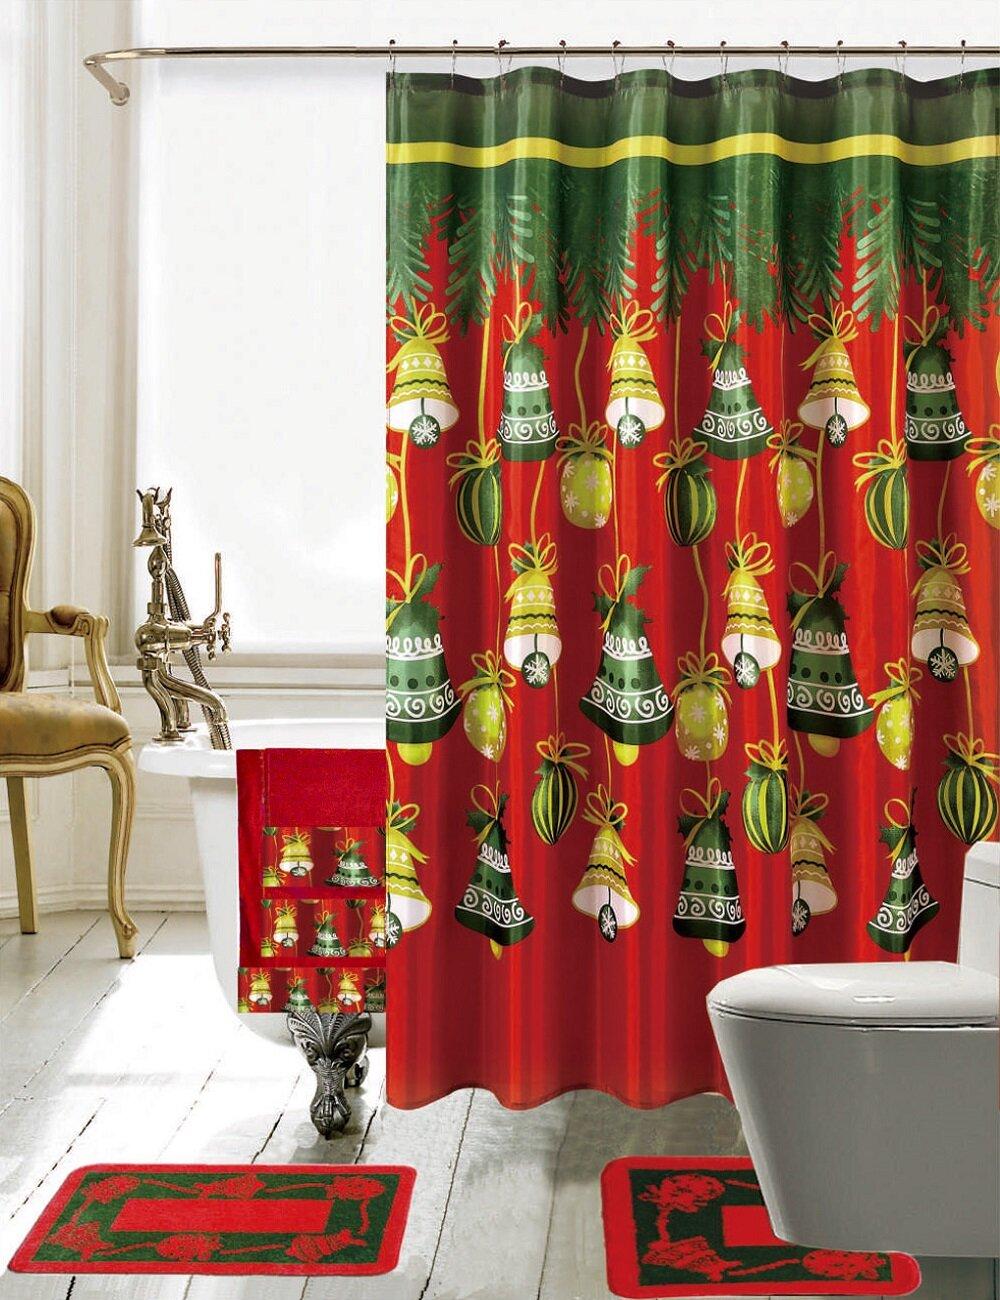 Daniels bath christmas bathroom decor 18 piece shower for Decorative pieces for bathroom